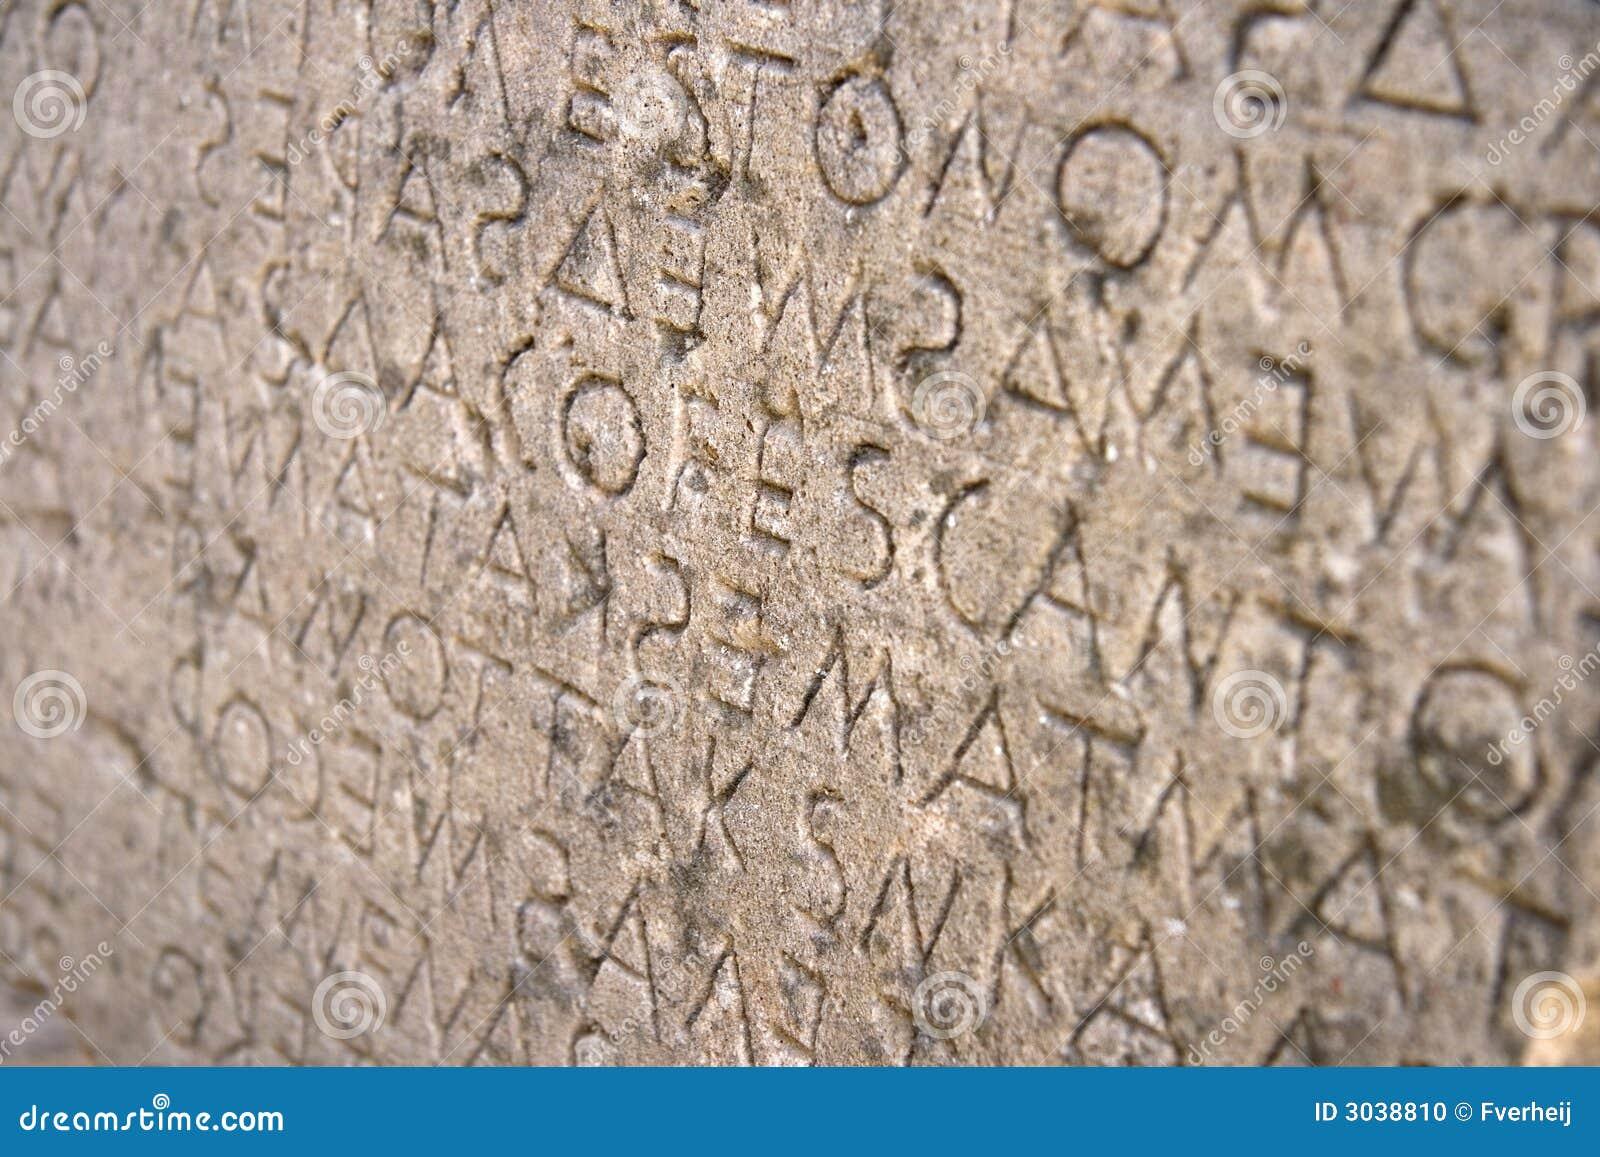 Ancient Greek Writing Ancient greek writing